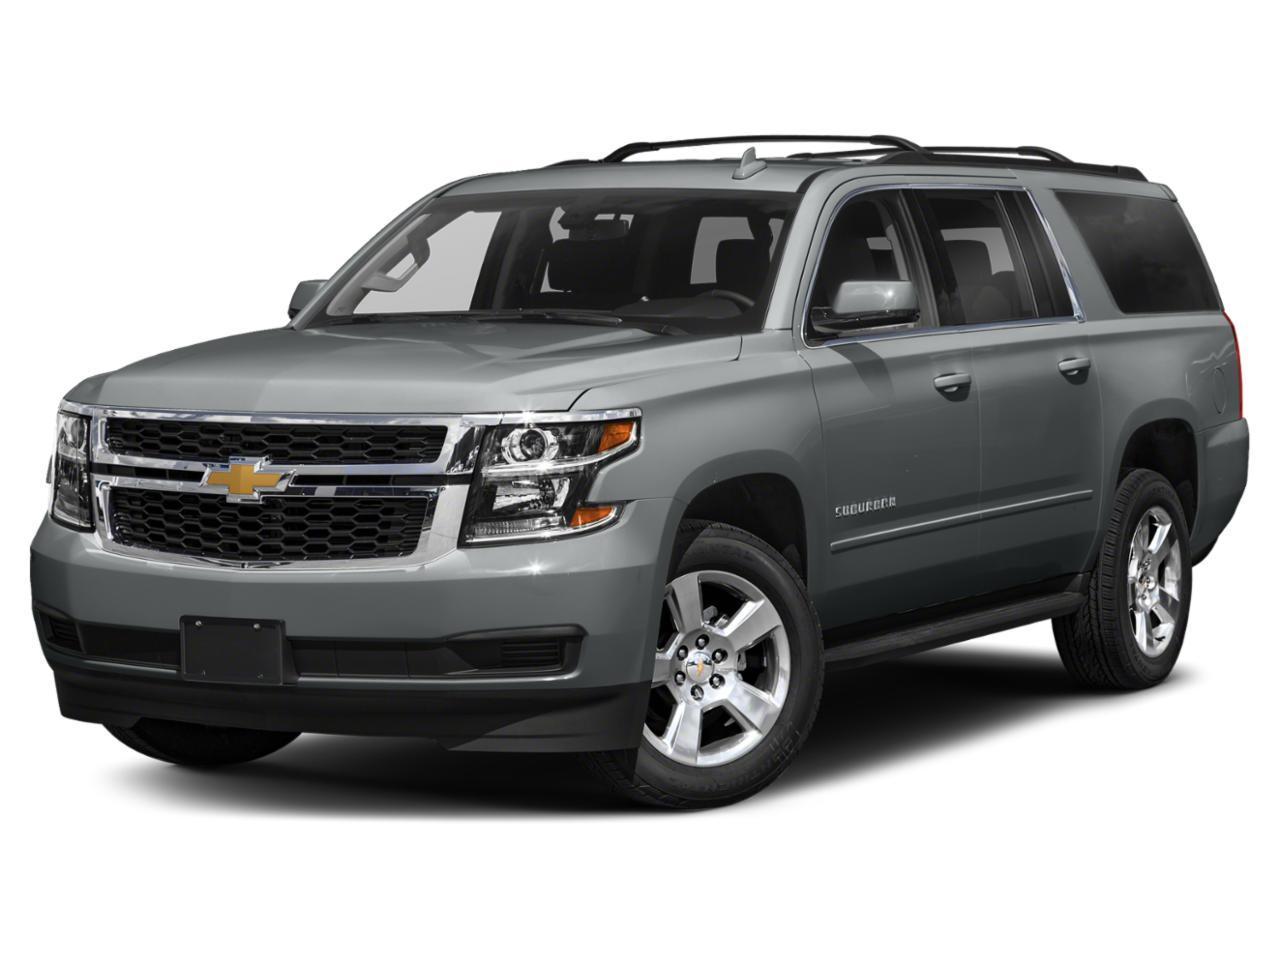 2020 Chevrolet Suburban Vehicle Photo in Sumner, WA 98390